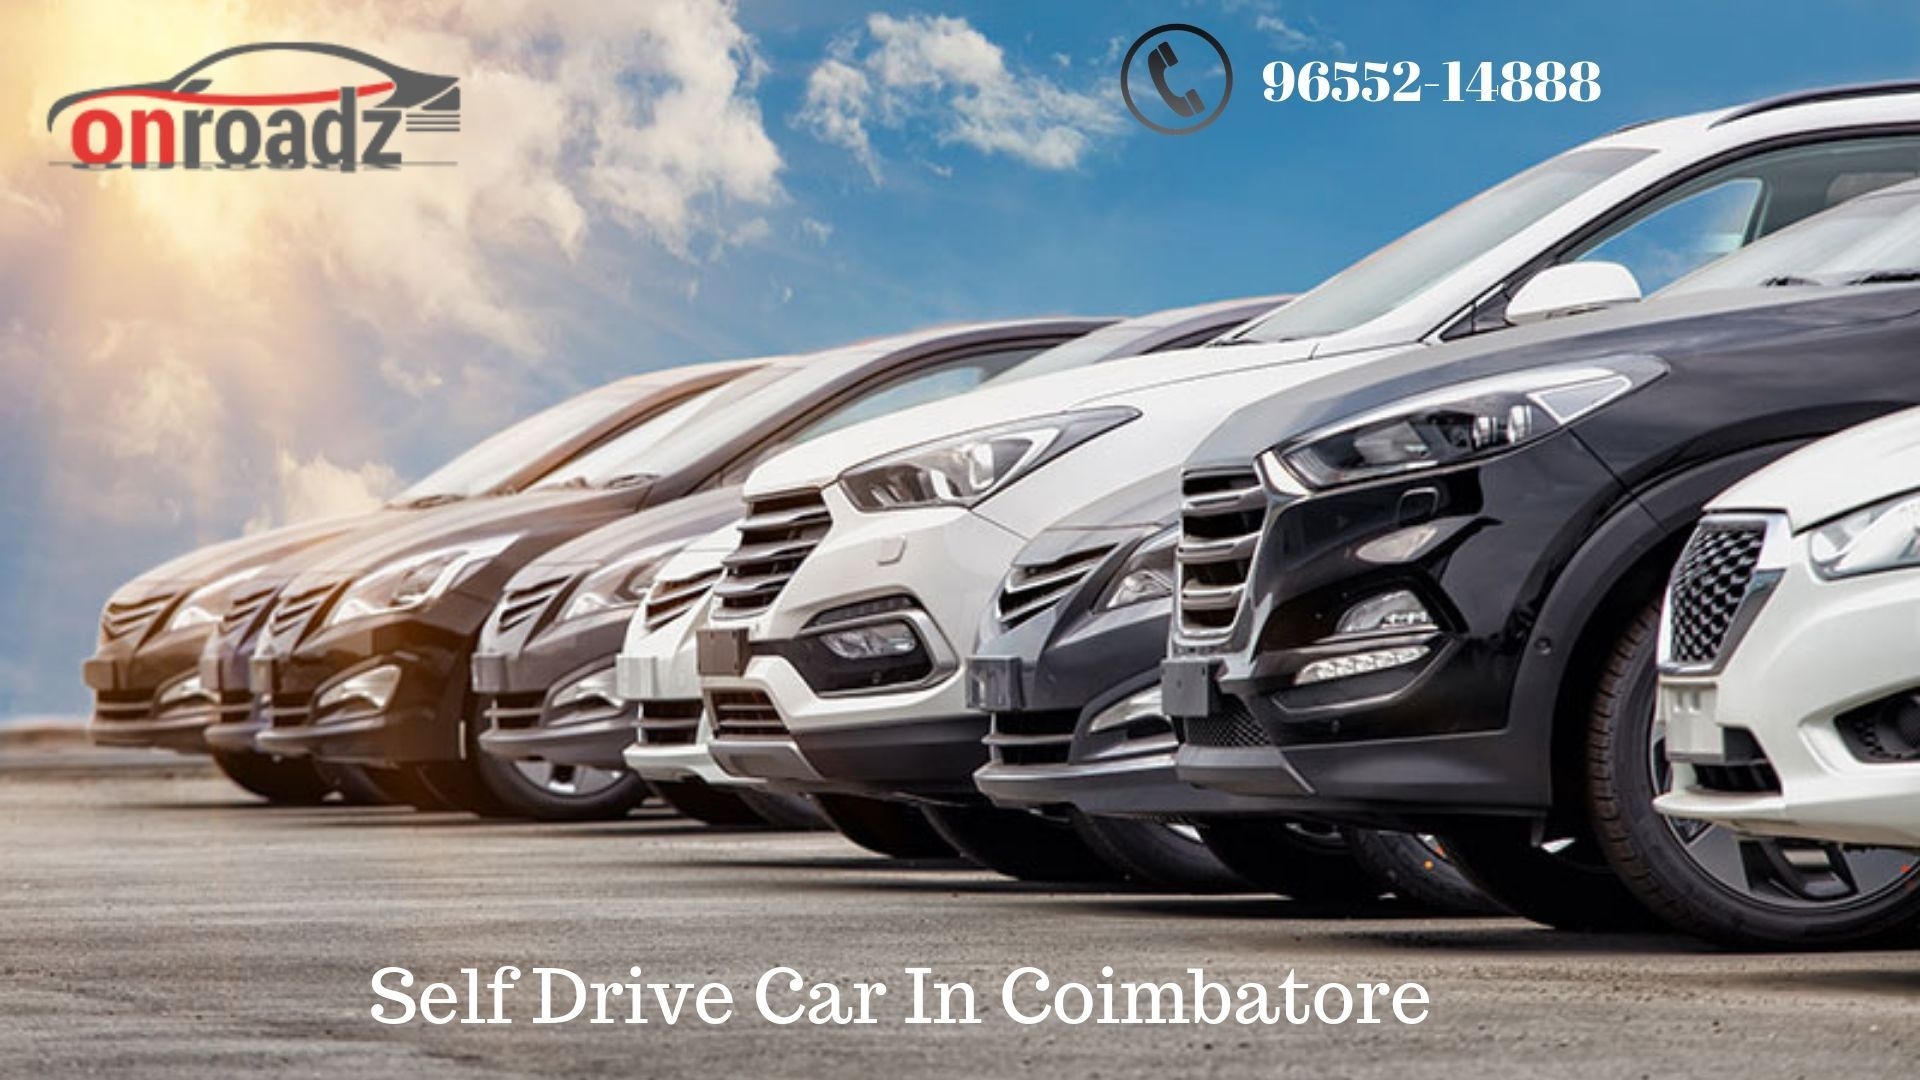 Onroadz Car Rental Car Buying Bmw Car Manufacturers